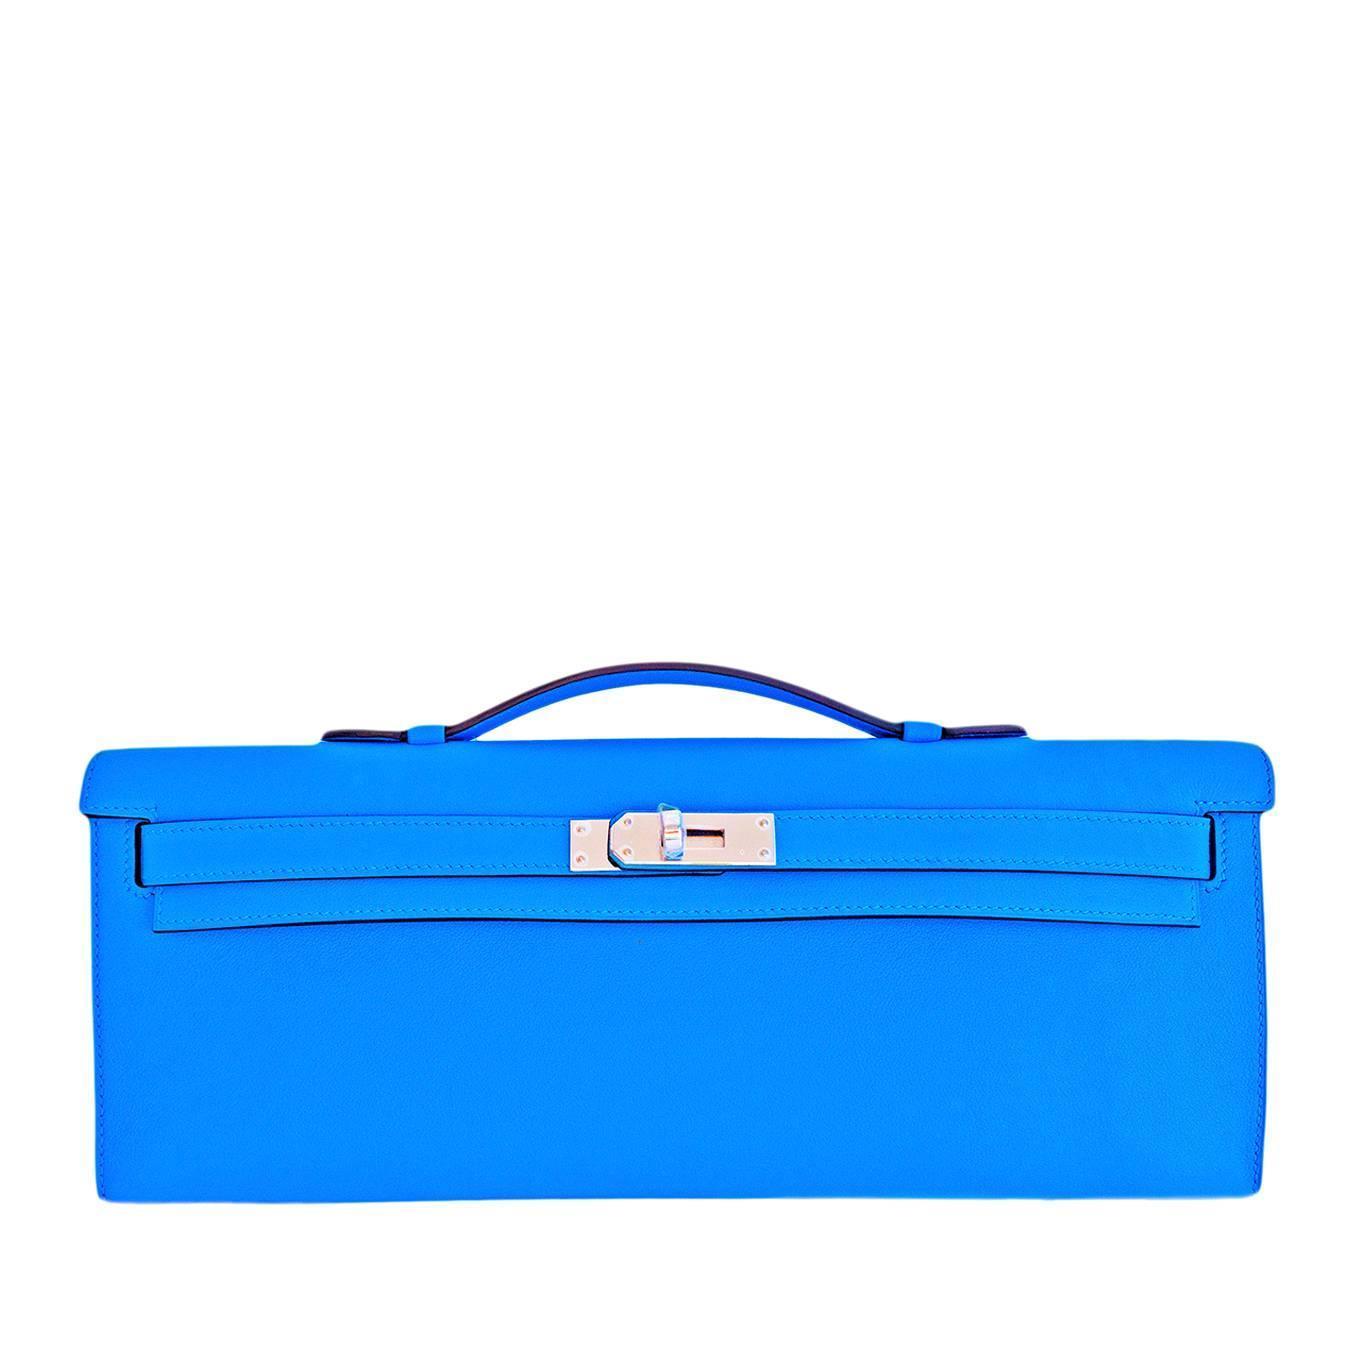 Hermes Blue Paradise Kelly Cut Pochette Clutch Swift Palladium Bag ...